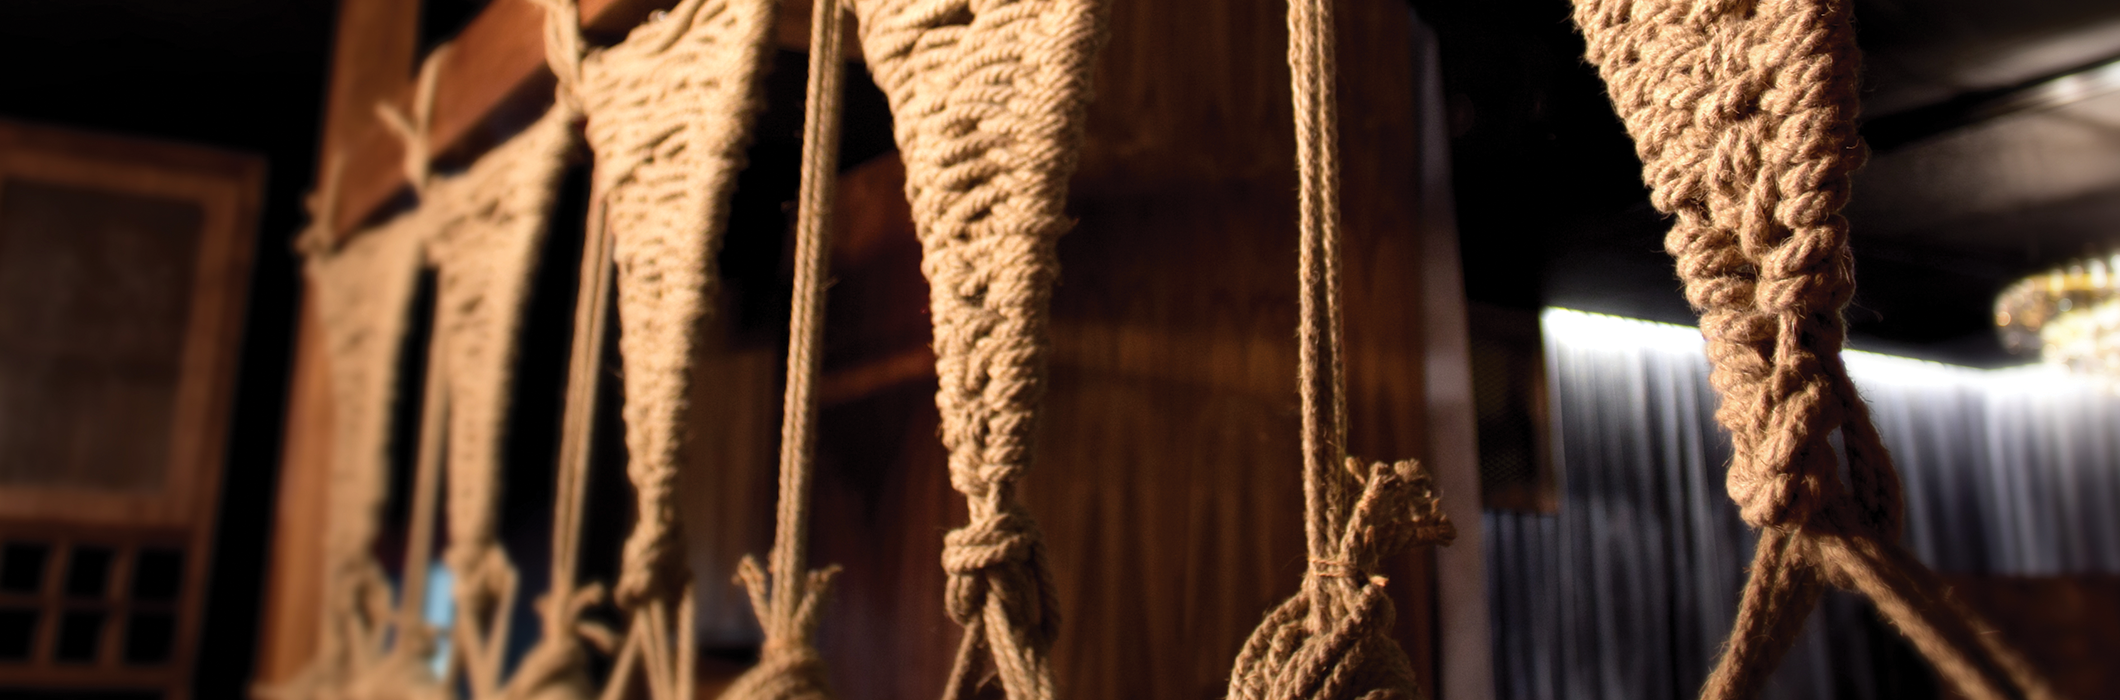 DM_rope_detail_03.png